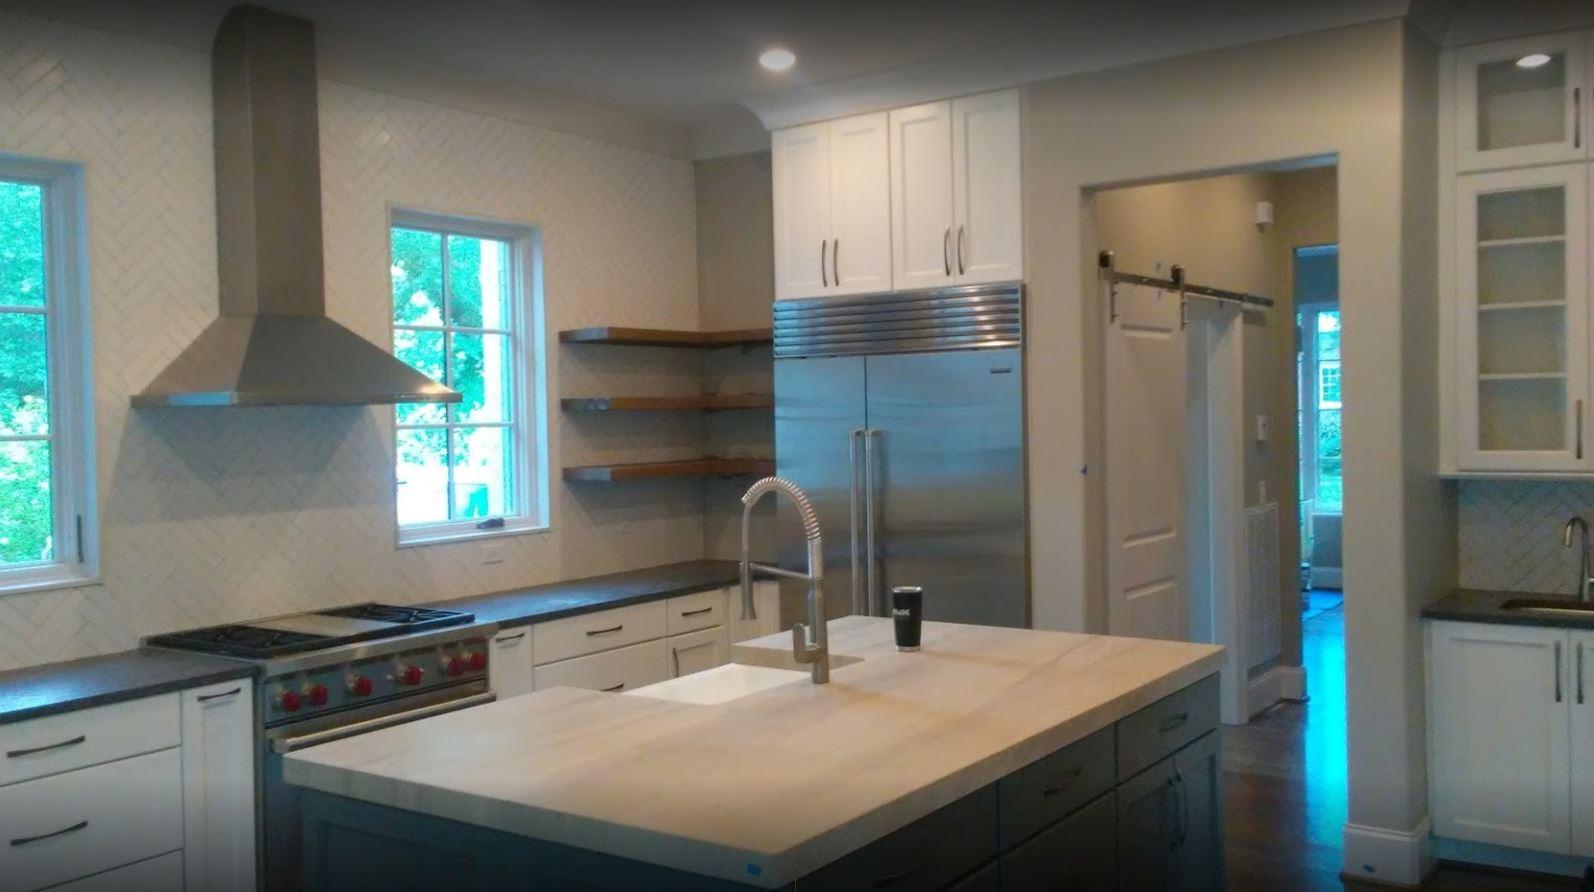 Oak Mountain Cabinetry Inc | Cabinetry Services | Pelham, AL